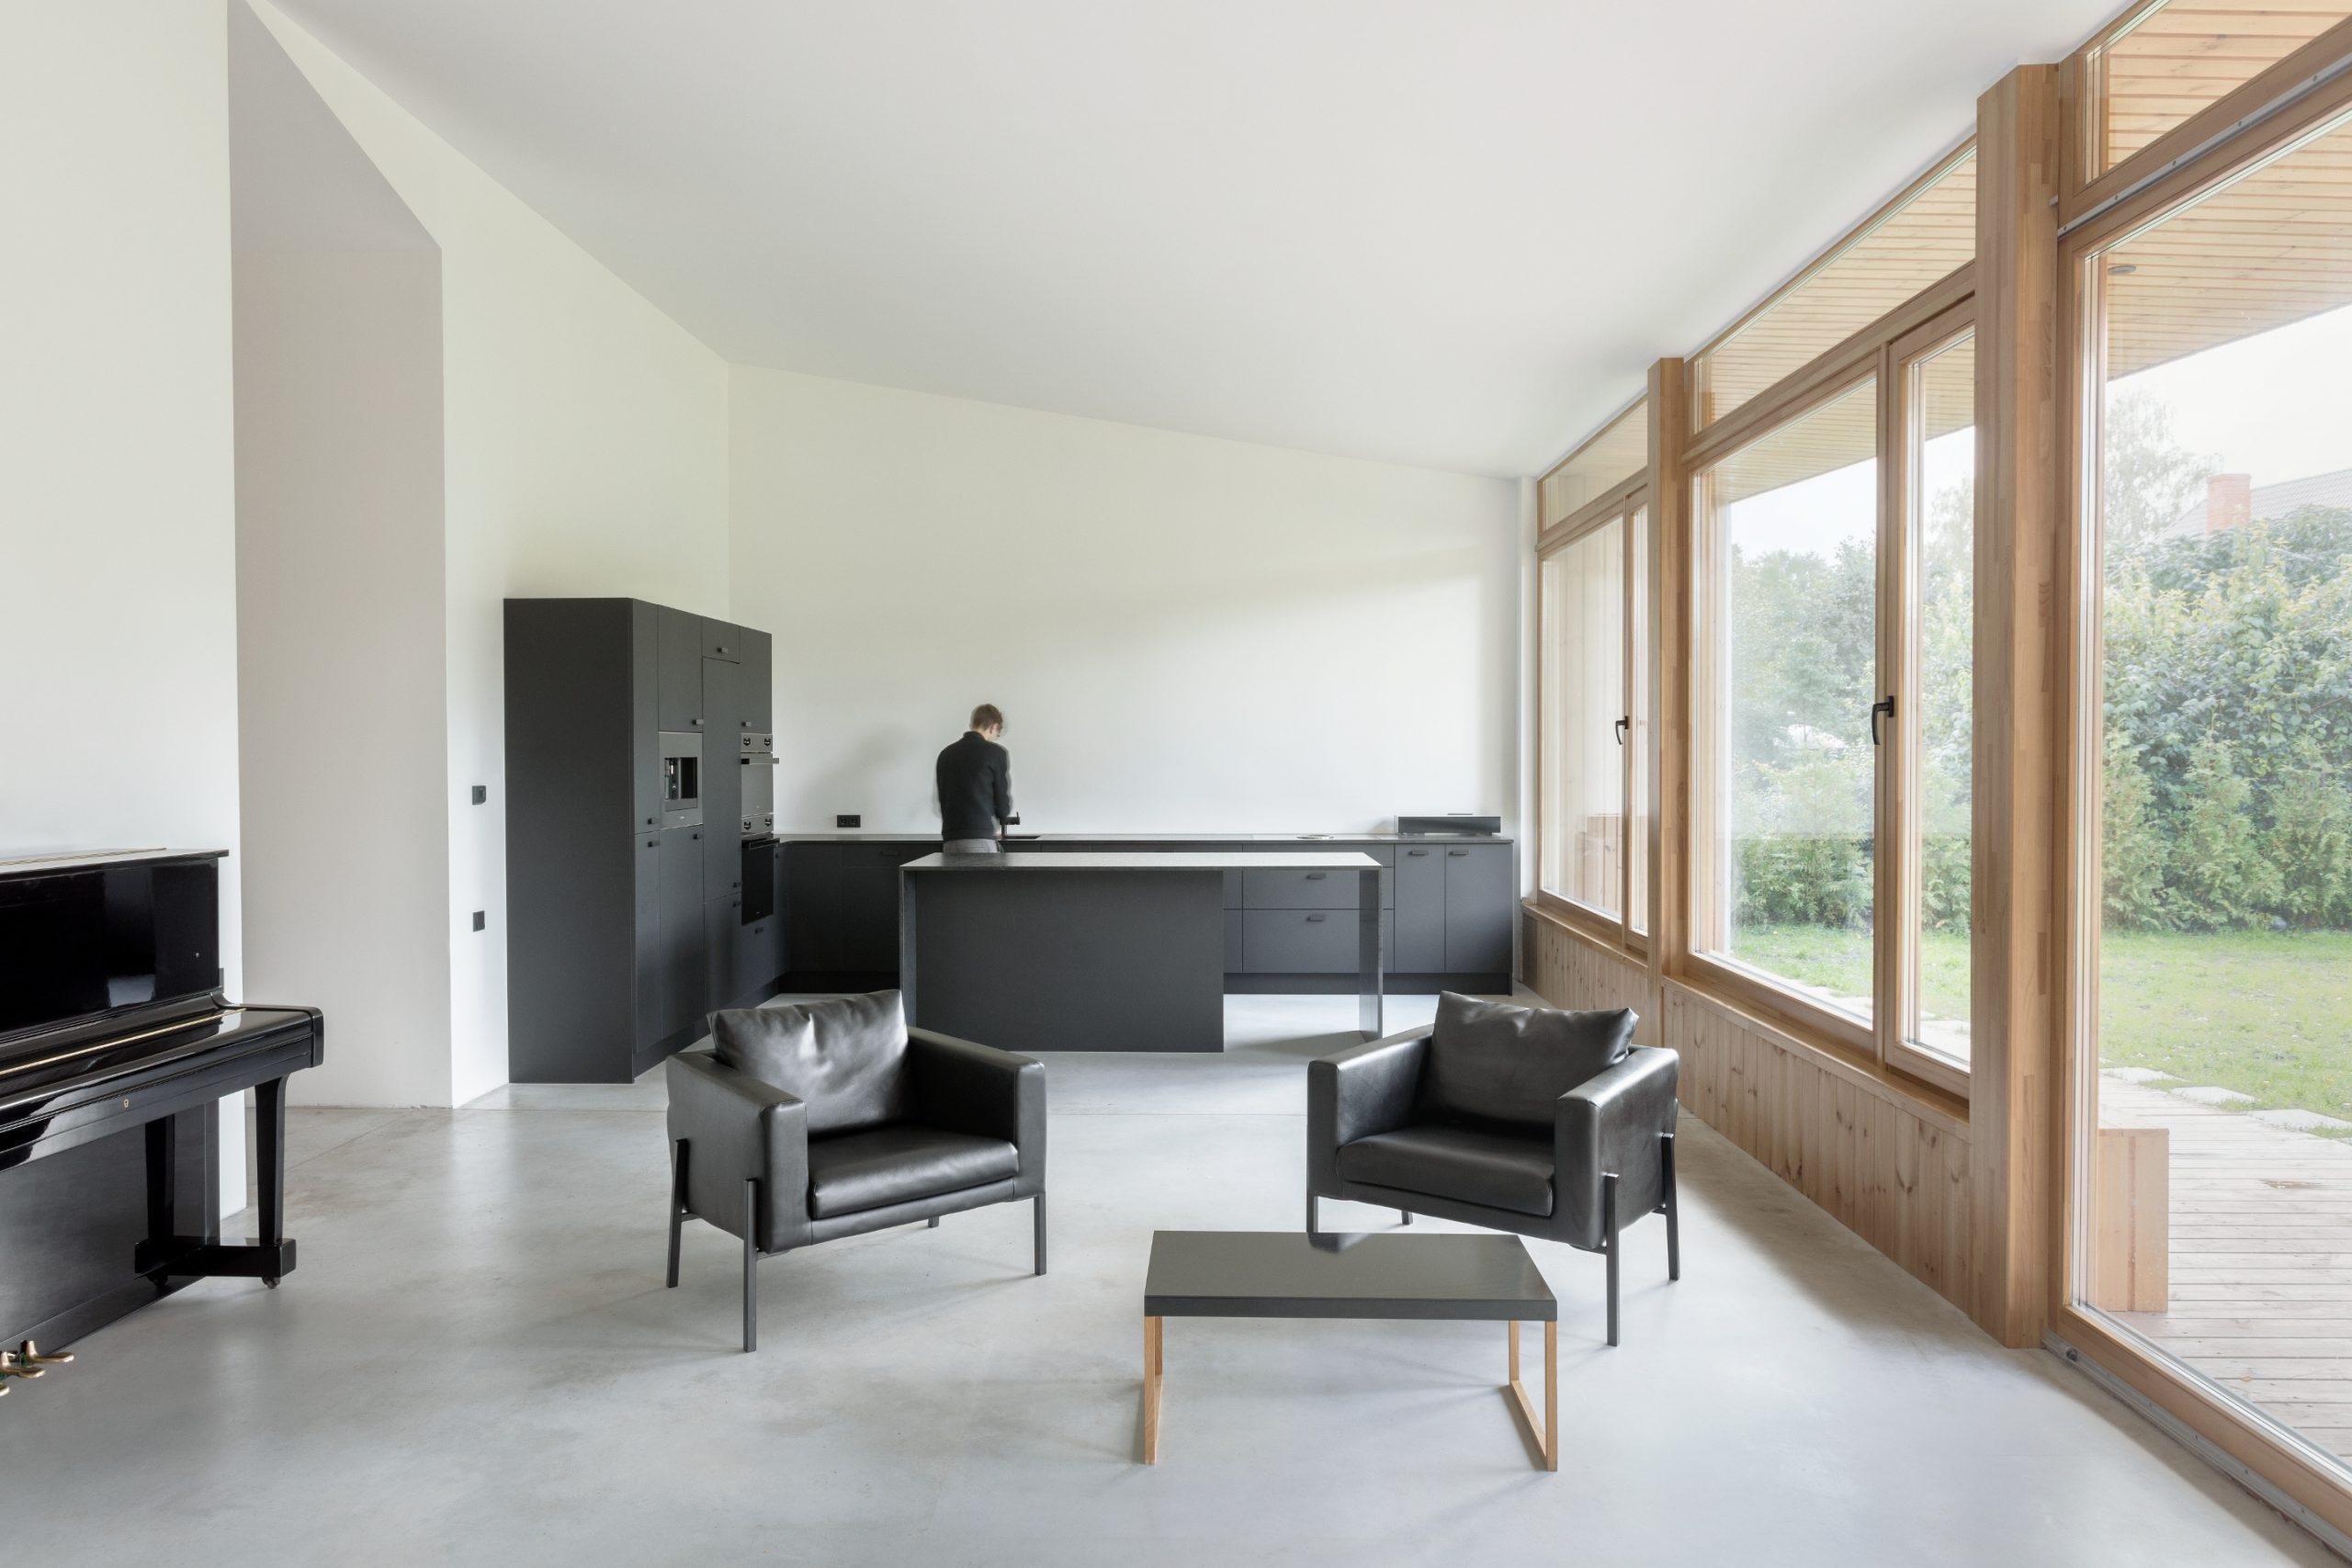 gaiss-four-roofs-14-photo-reinis-hofmanis-2880px